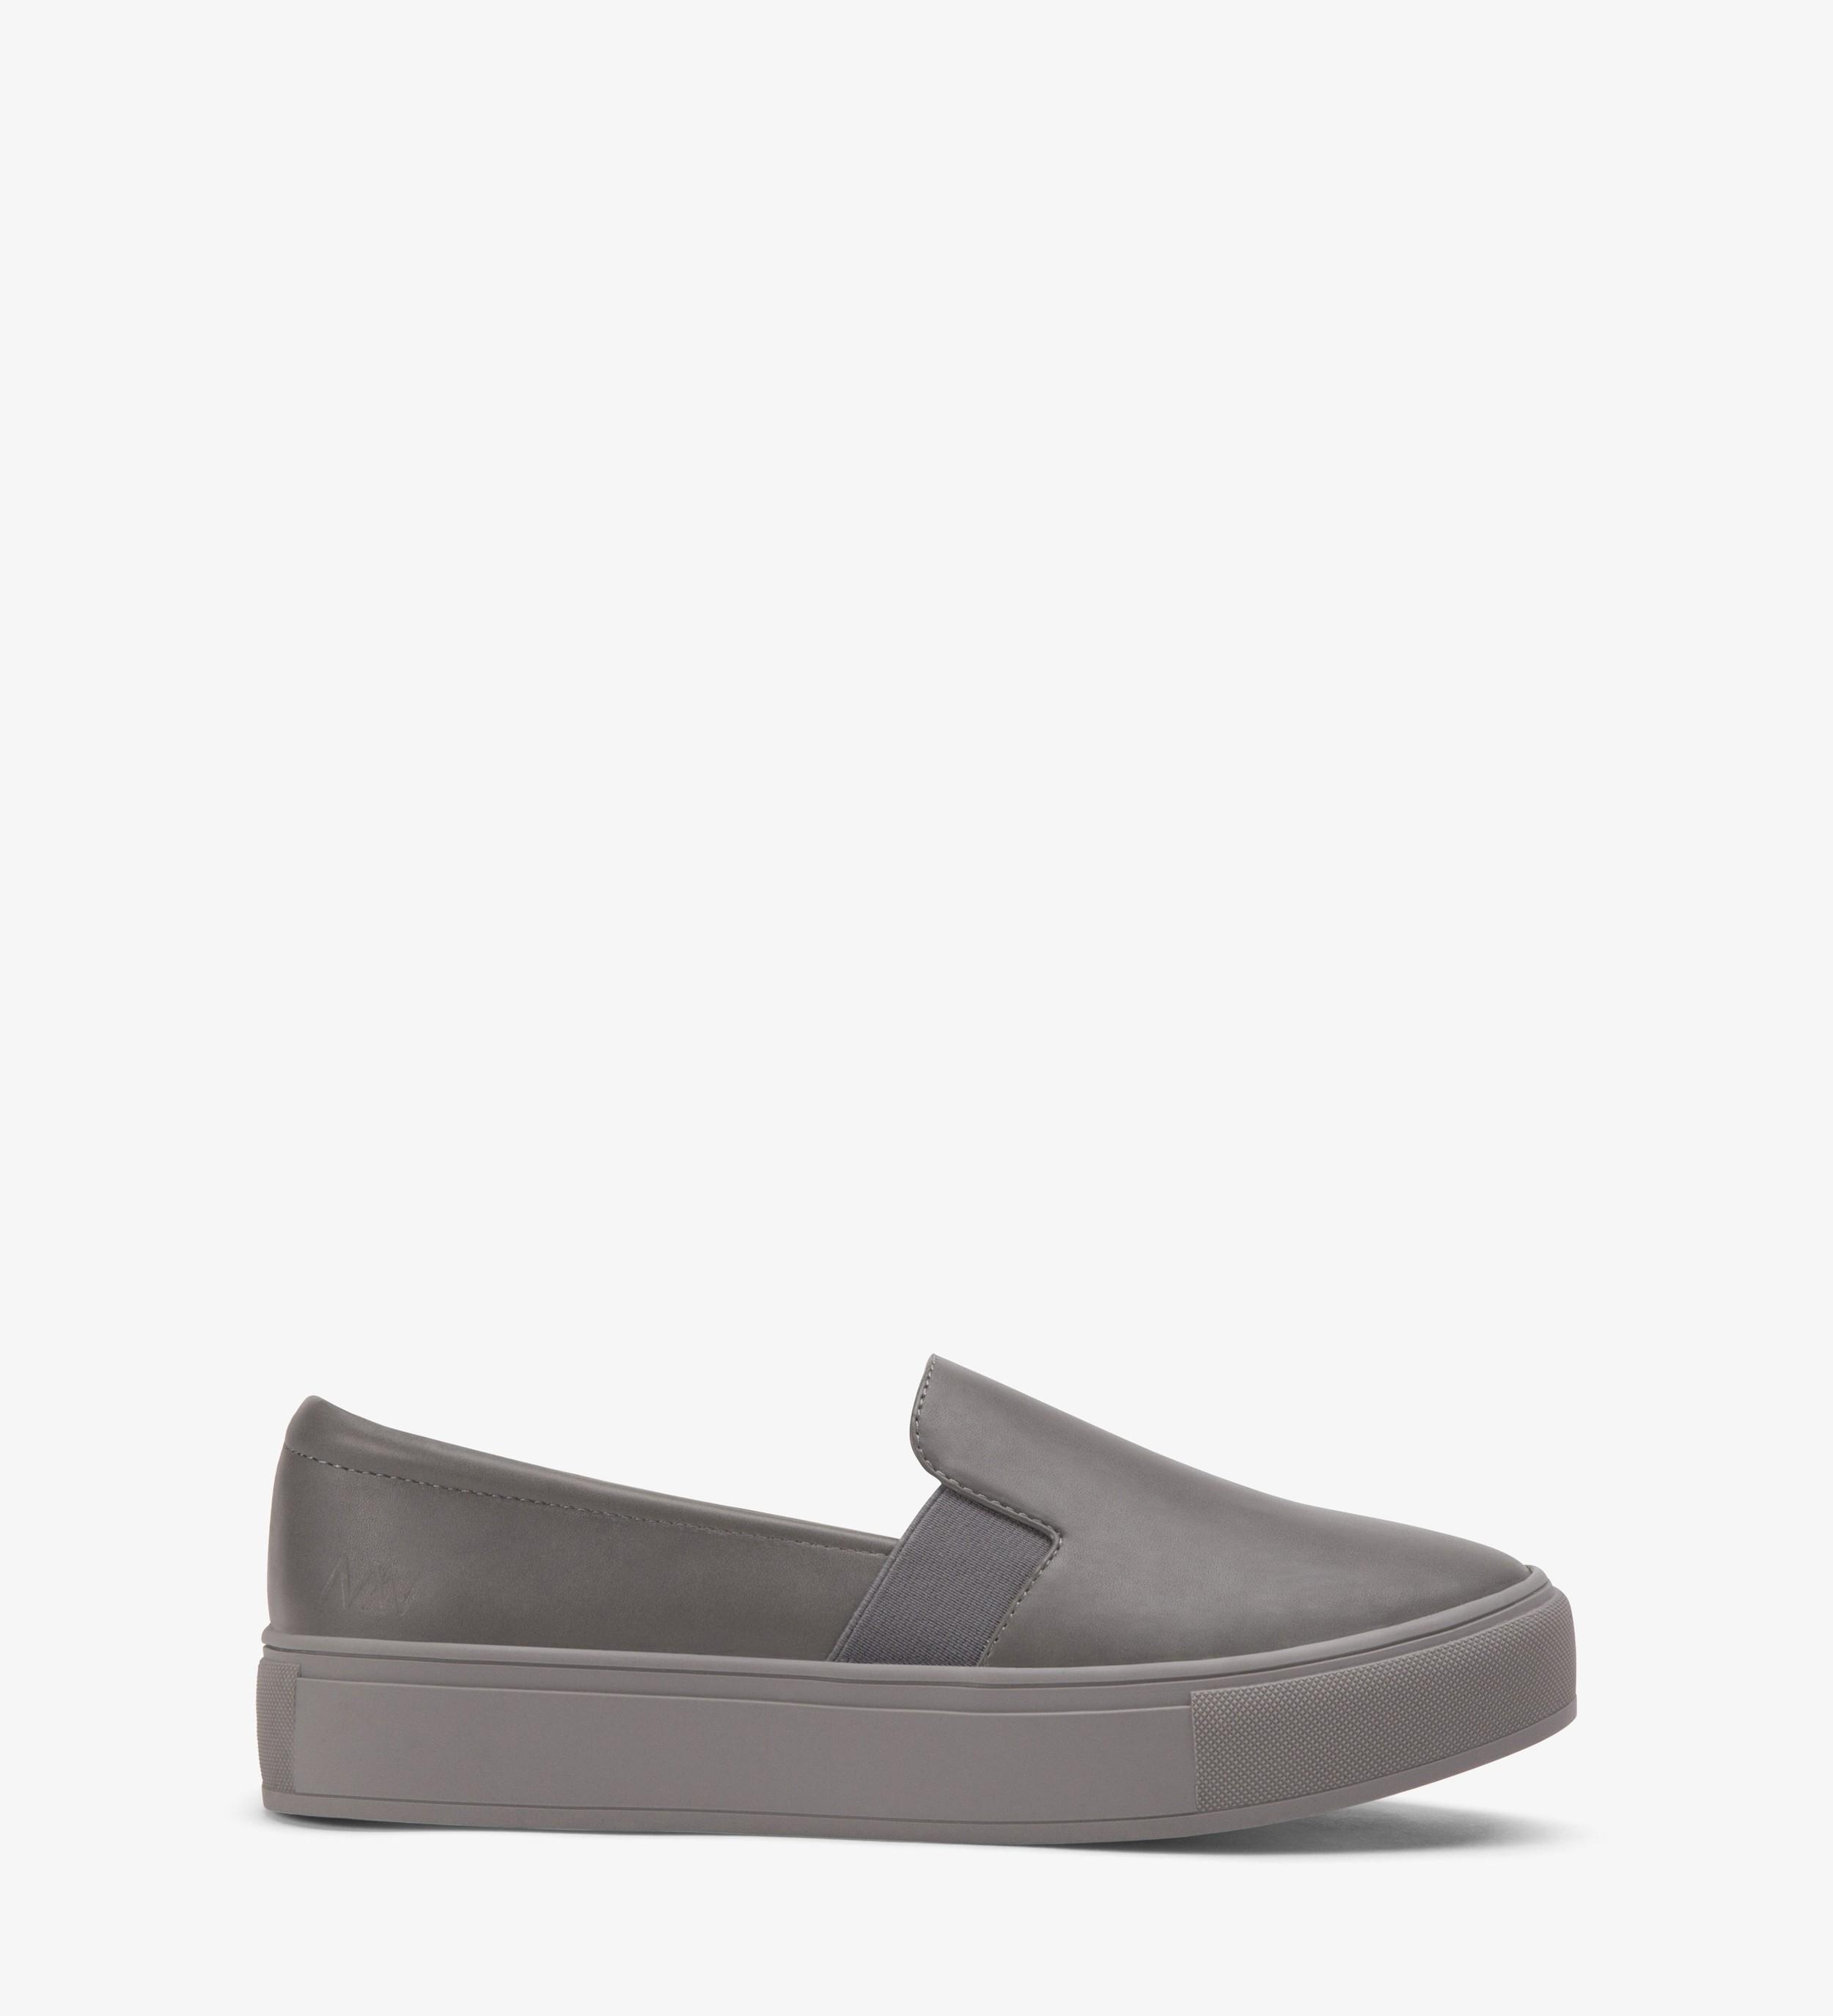 Berri Shoe in Cement - USD $90